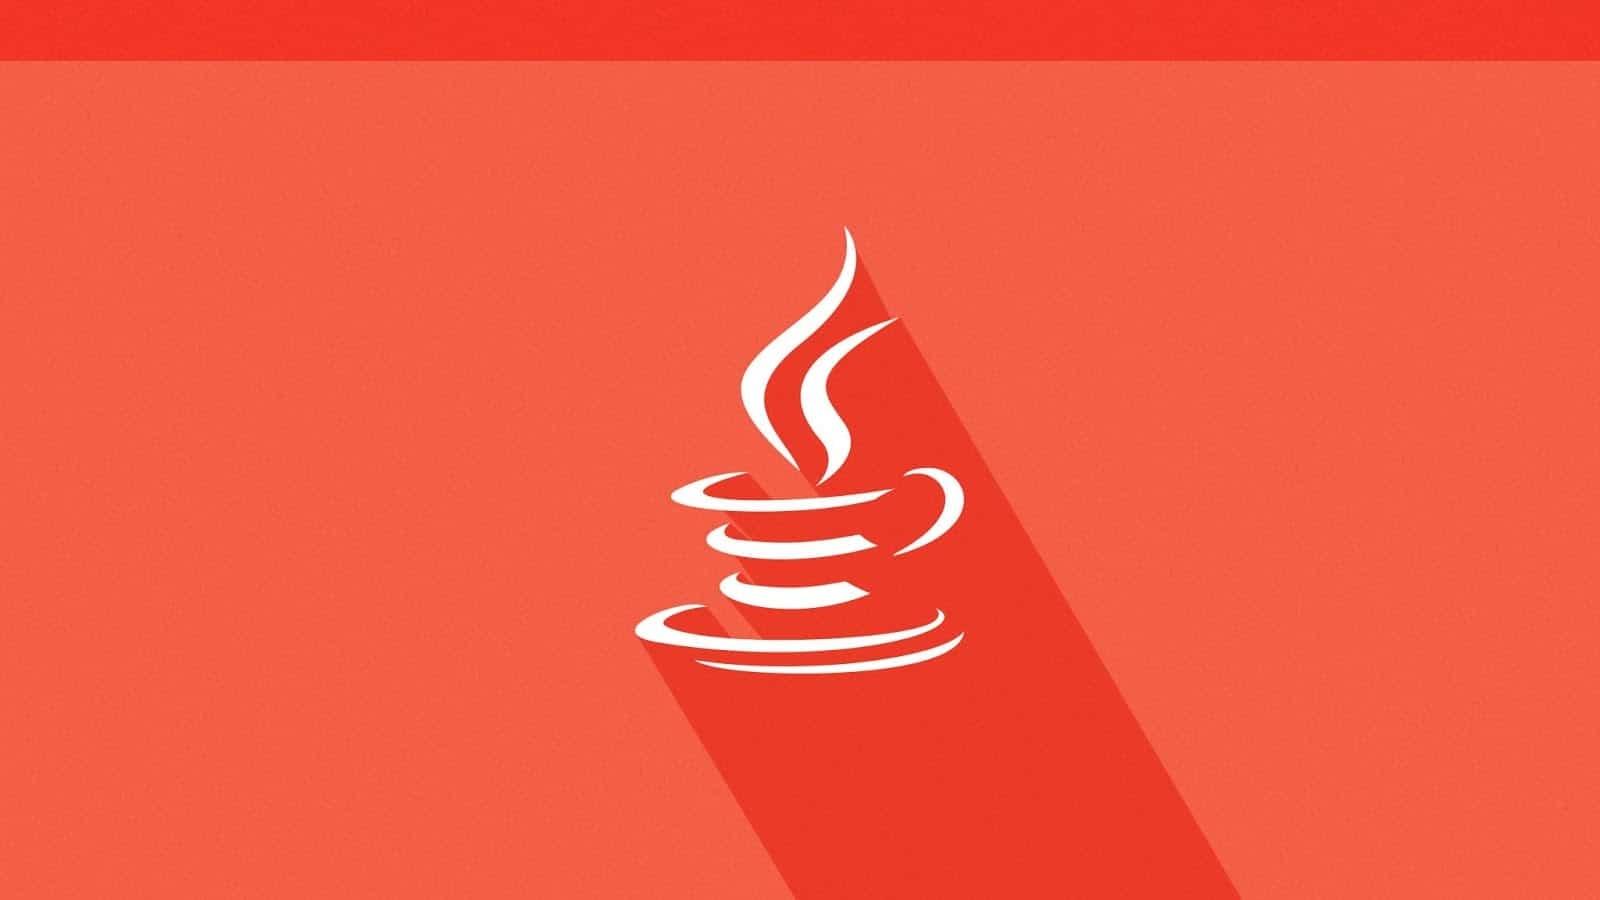 SmartBrains-java-Programming-Software-development-Web-Development-winter-Summer-Training-Noida-Chennai-Pune-Mumbai-Dehradun-